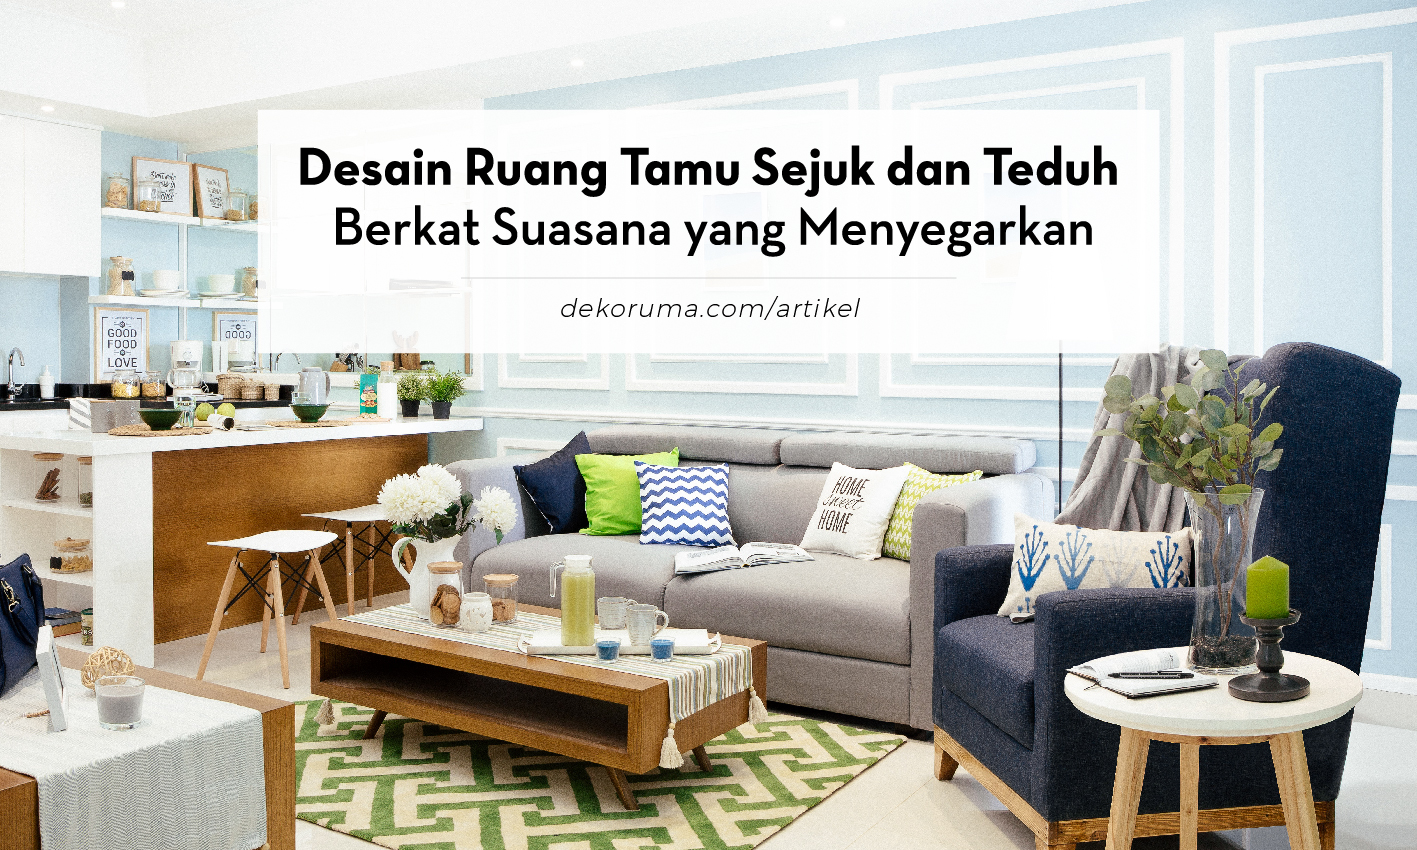 Desain Ruang Tamu Sejuk Dan Teduhjpgfit1417850ssl1